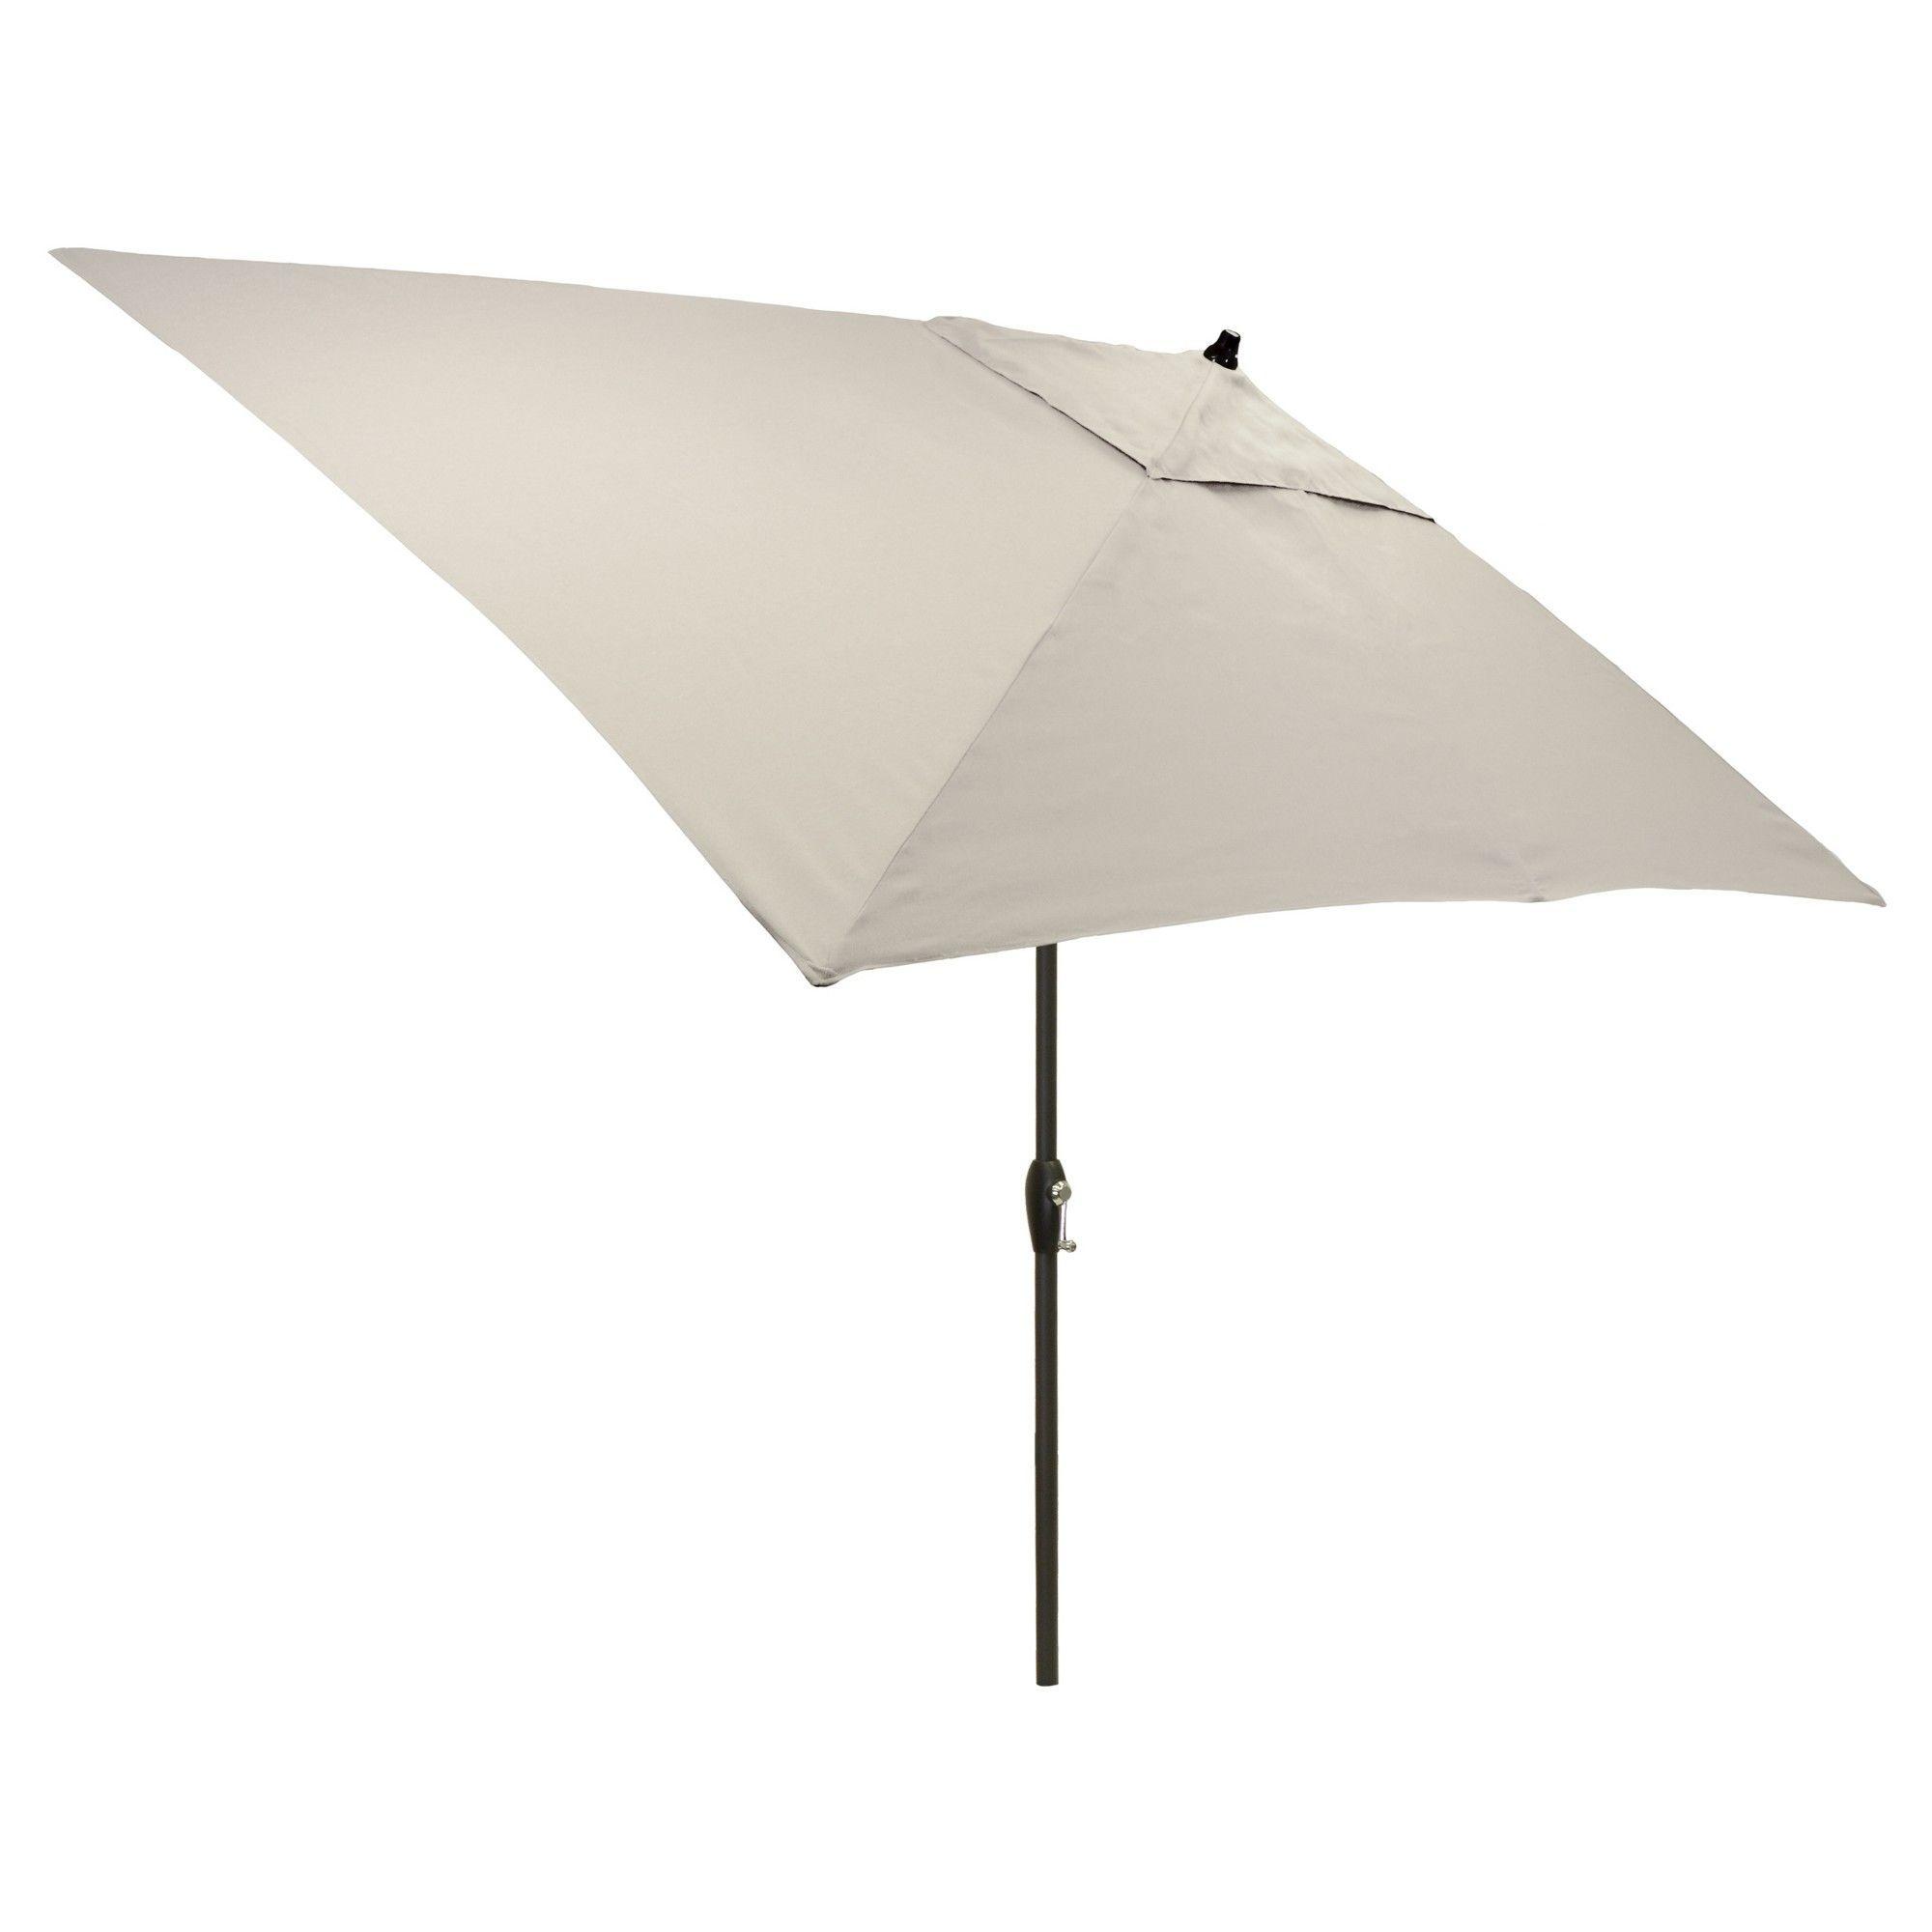 6 5 X 10 Rectangular Patio Umbrella Linen Black Pole